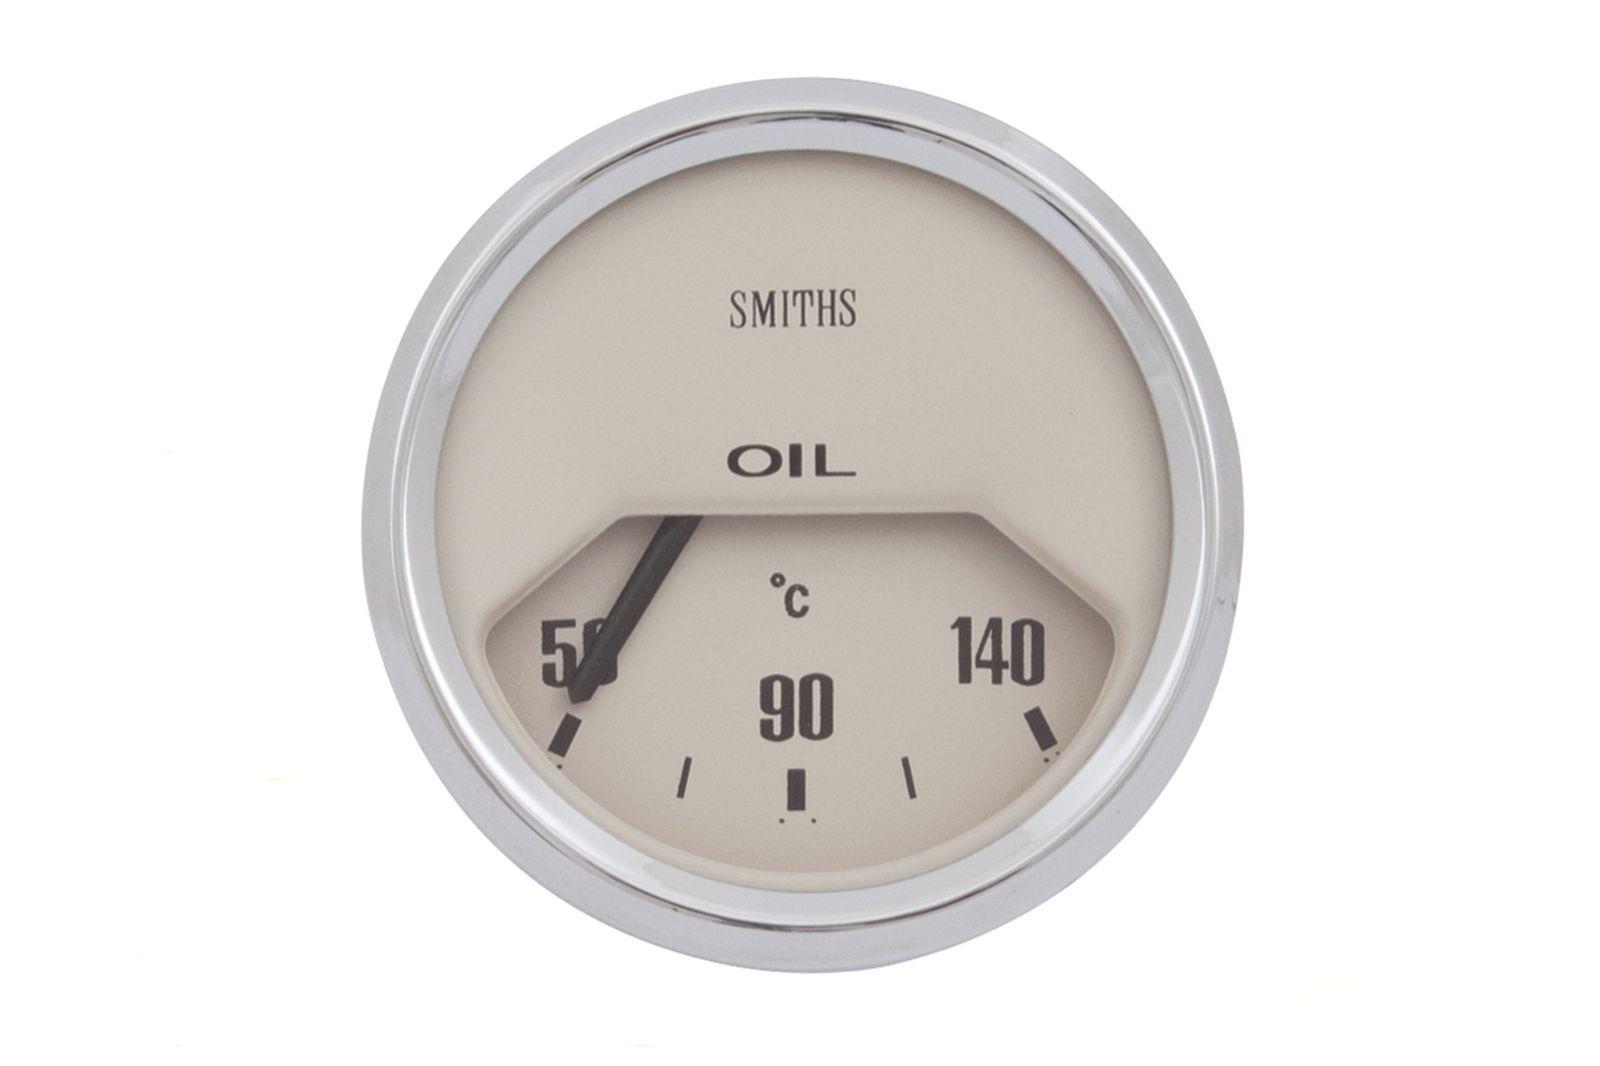 #Öldruck Instrument 52 mm Dia. helles Ziffernblatt, GAE0129M